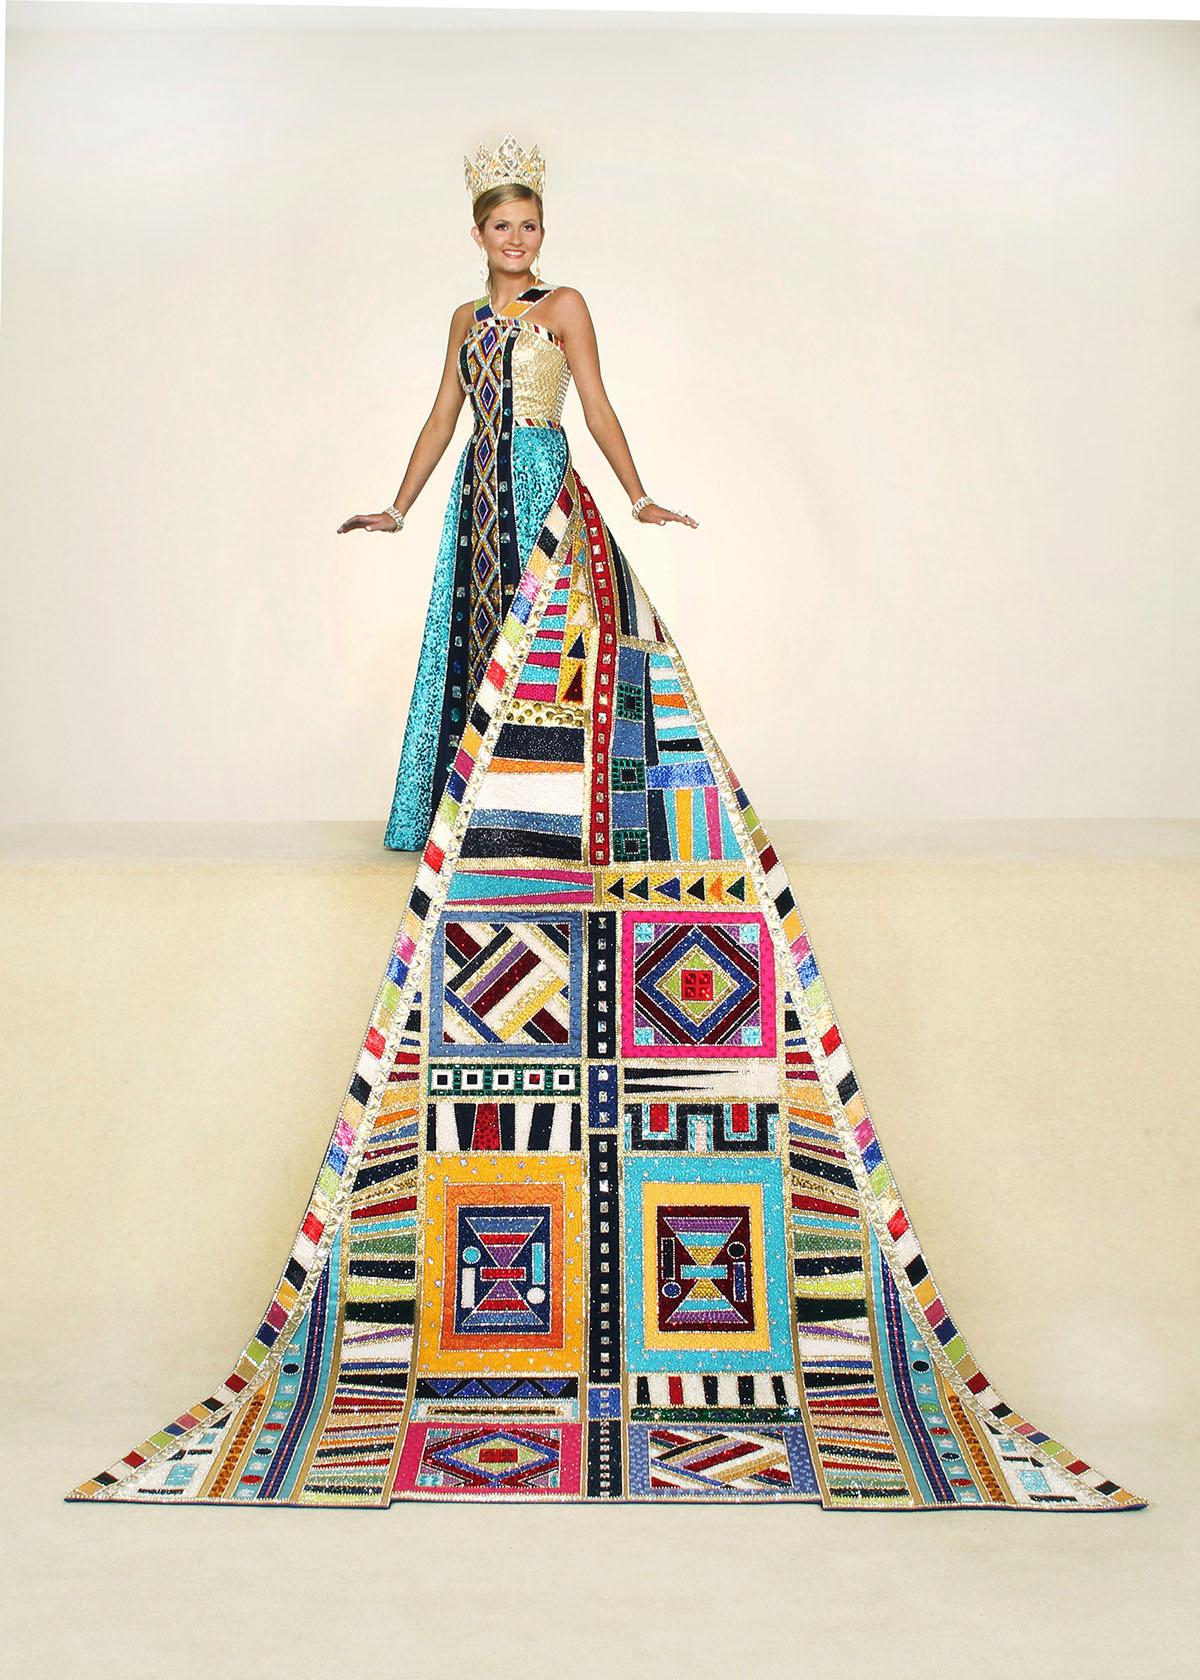 Elizabeth Ernst, Duchess Of Colorful Masterpieces